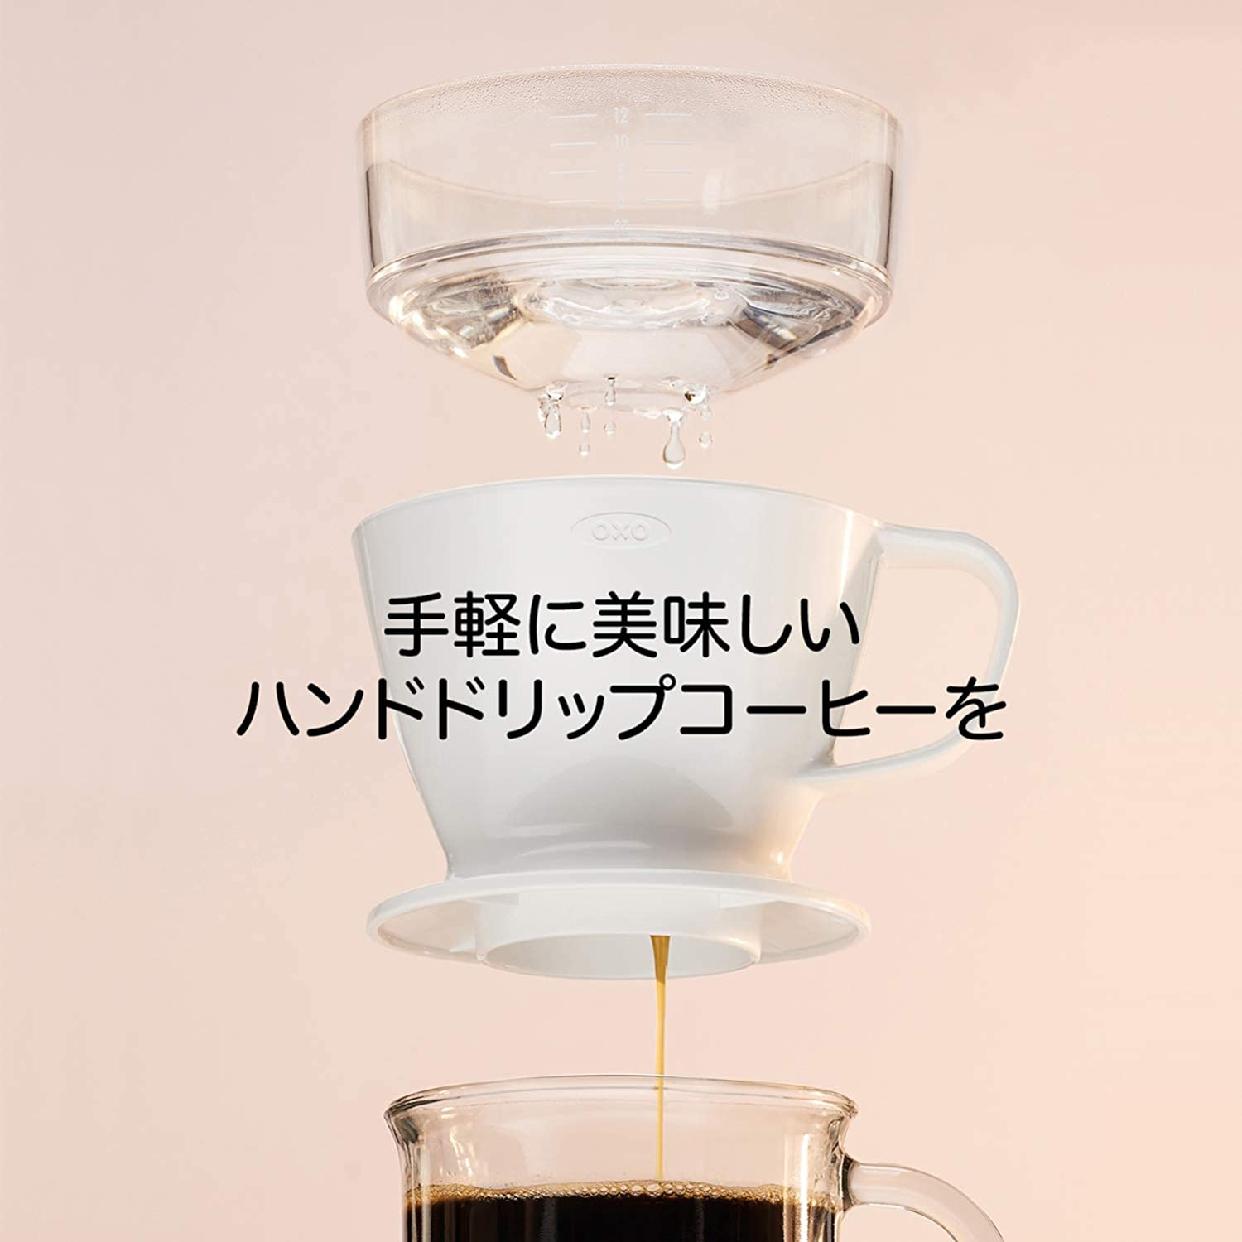 OXO(オクソー) オートドリップコーヒーメーカー 11180100の商品画像2